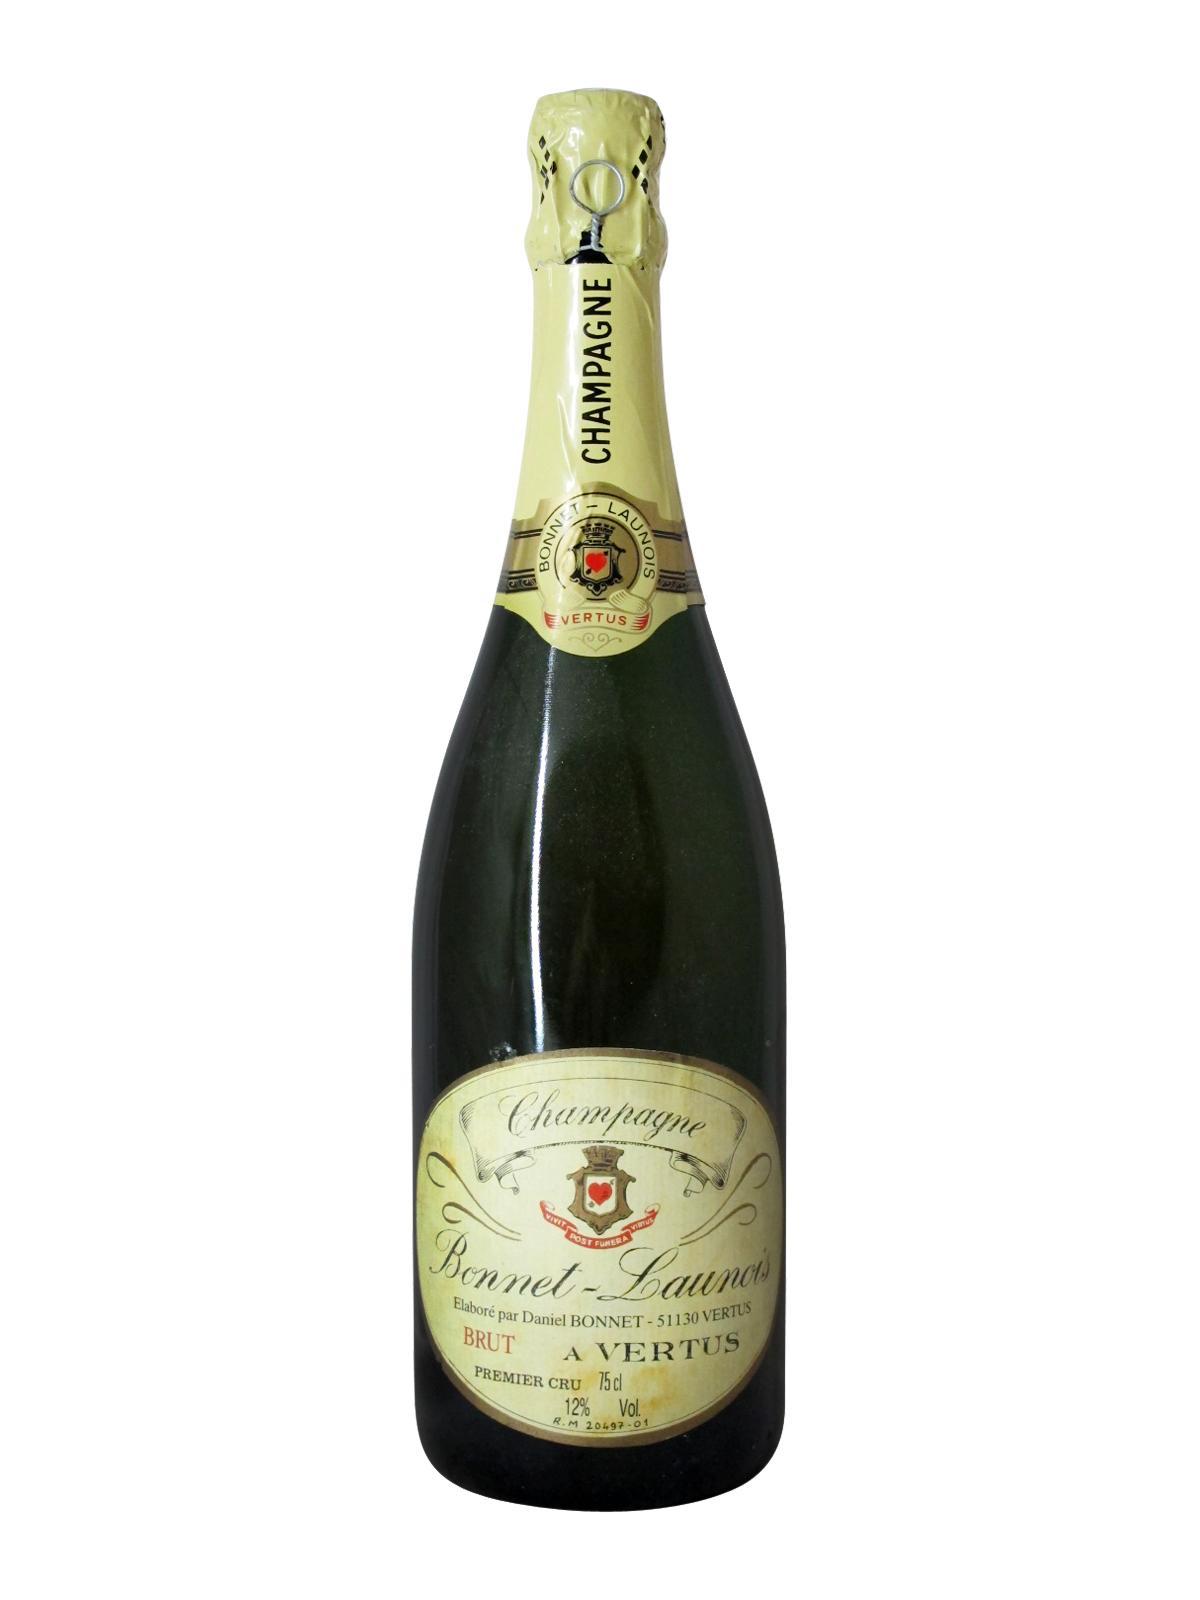 Champagne launois millesime